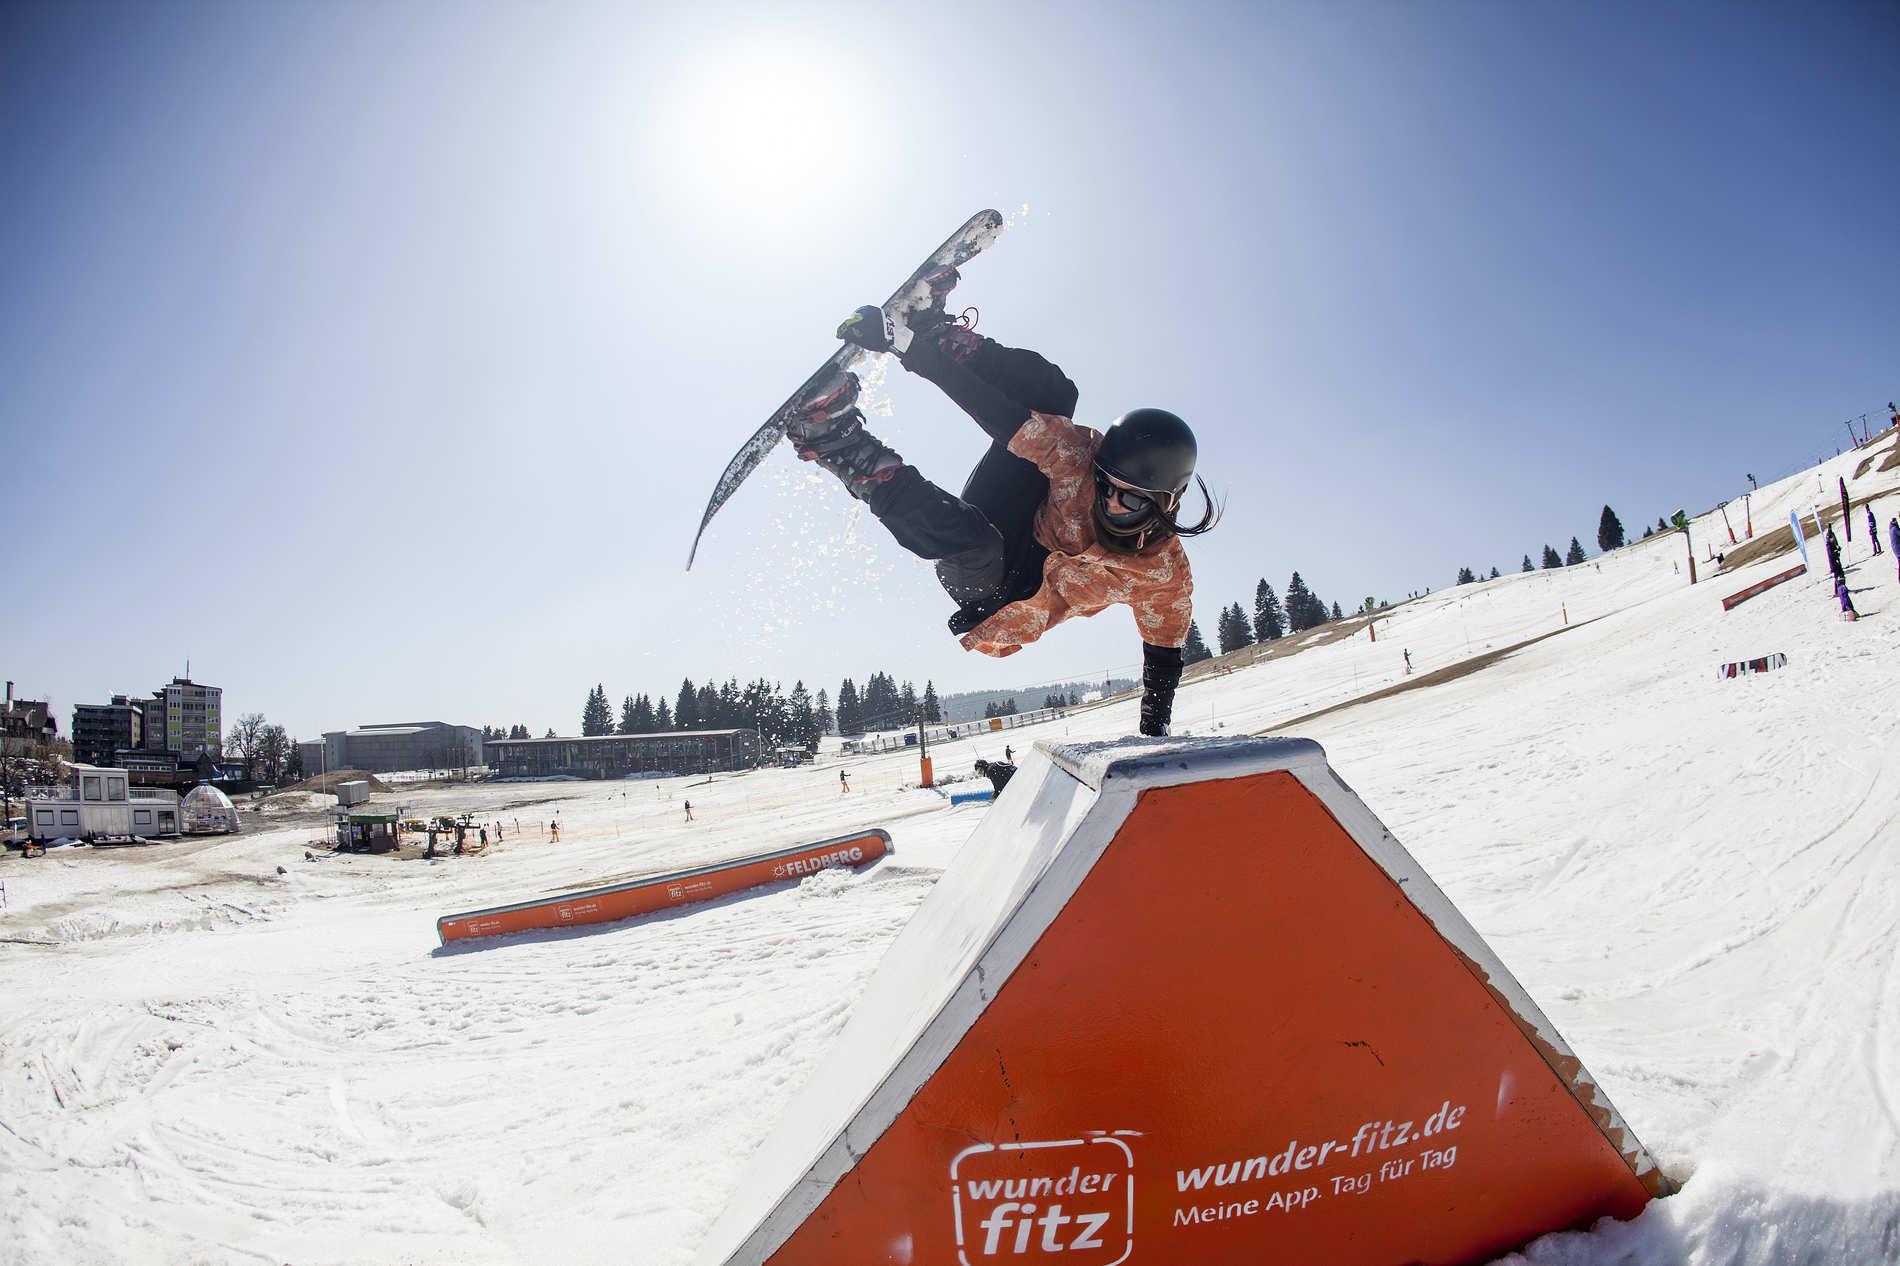 web snowpark feldberg 25 03 2017 action sb gyo yoshida martin herrmann qparks 1